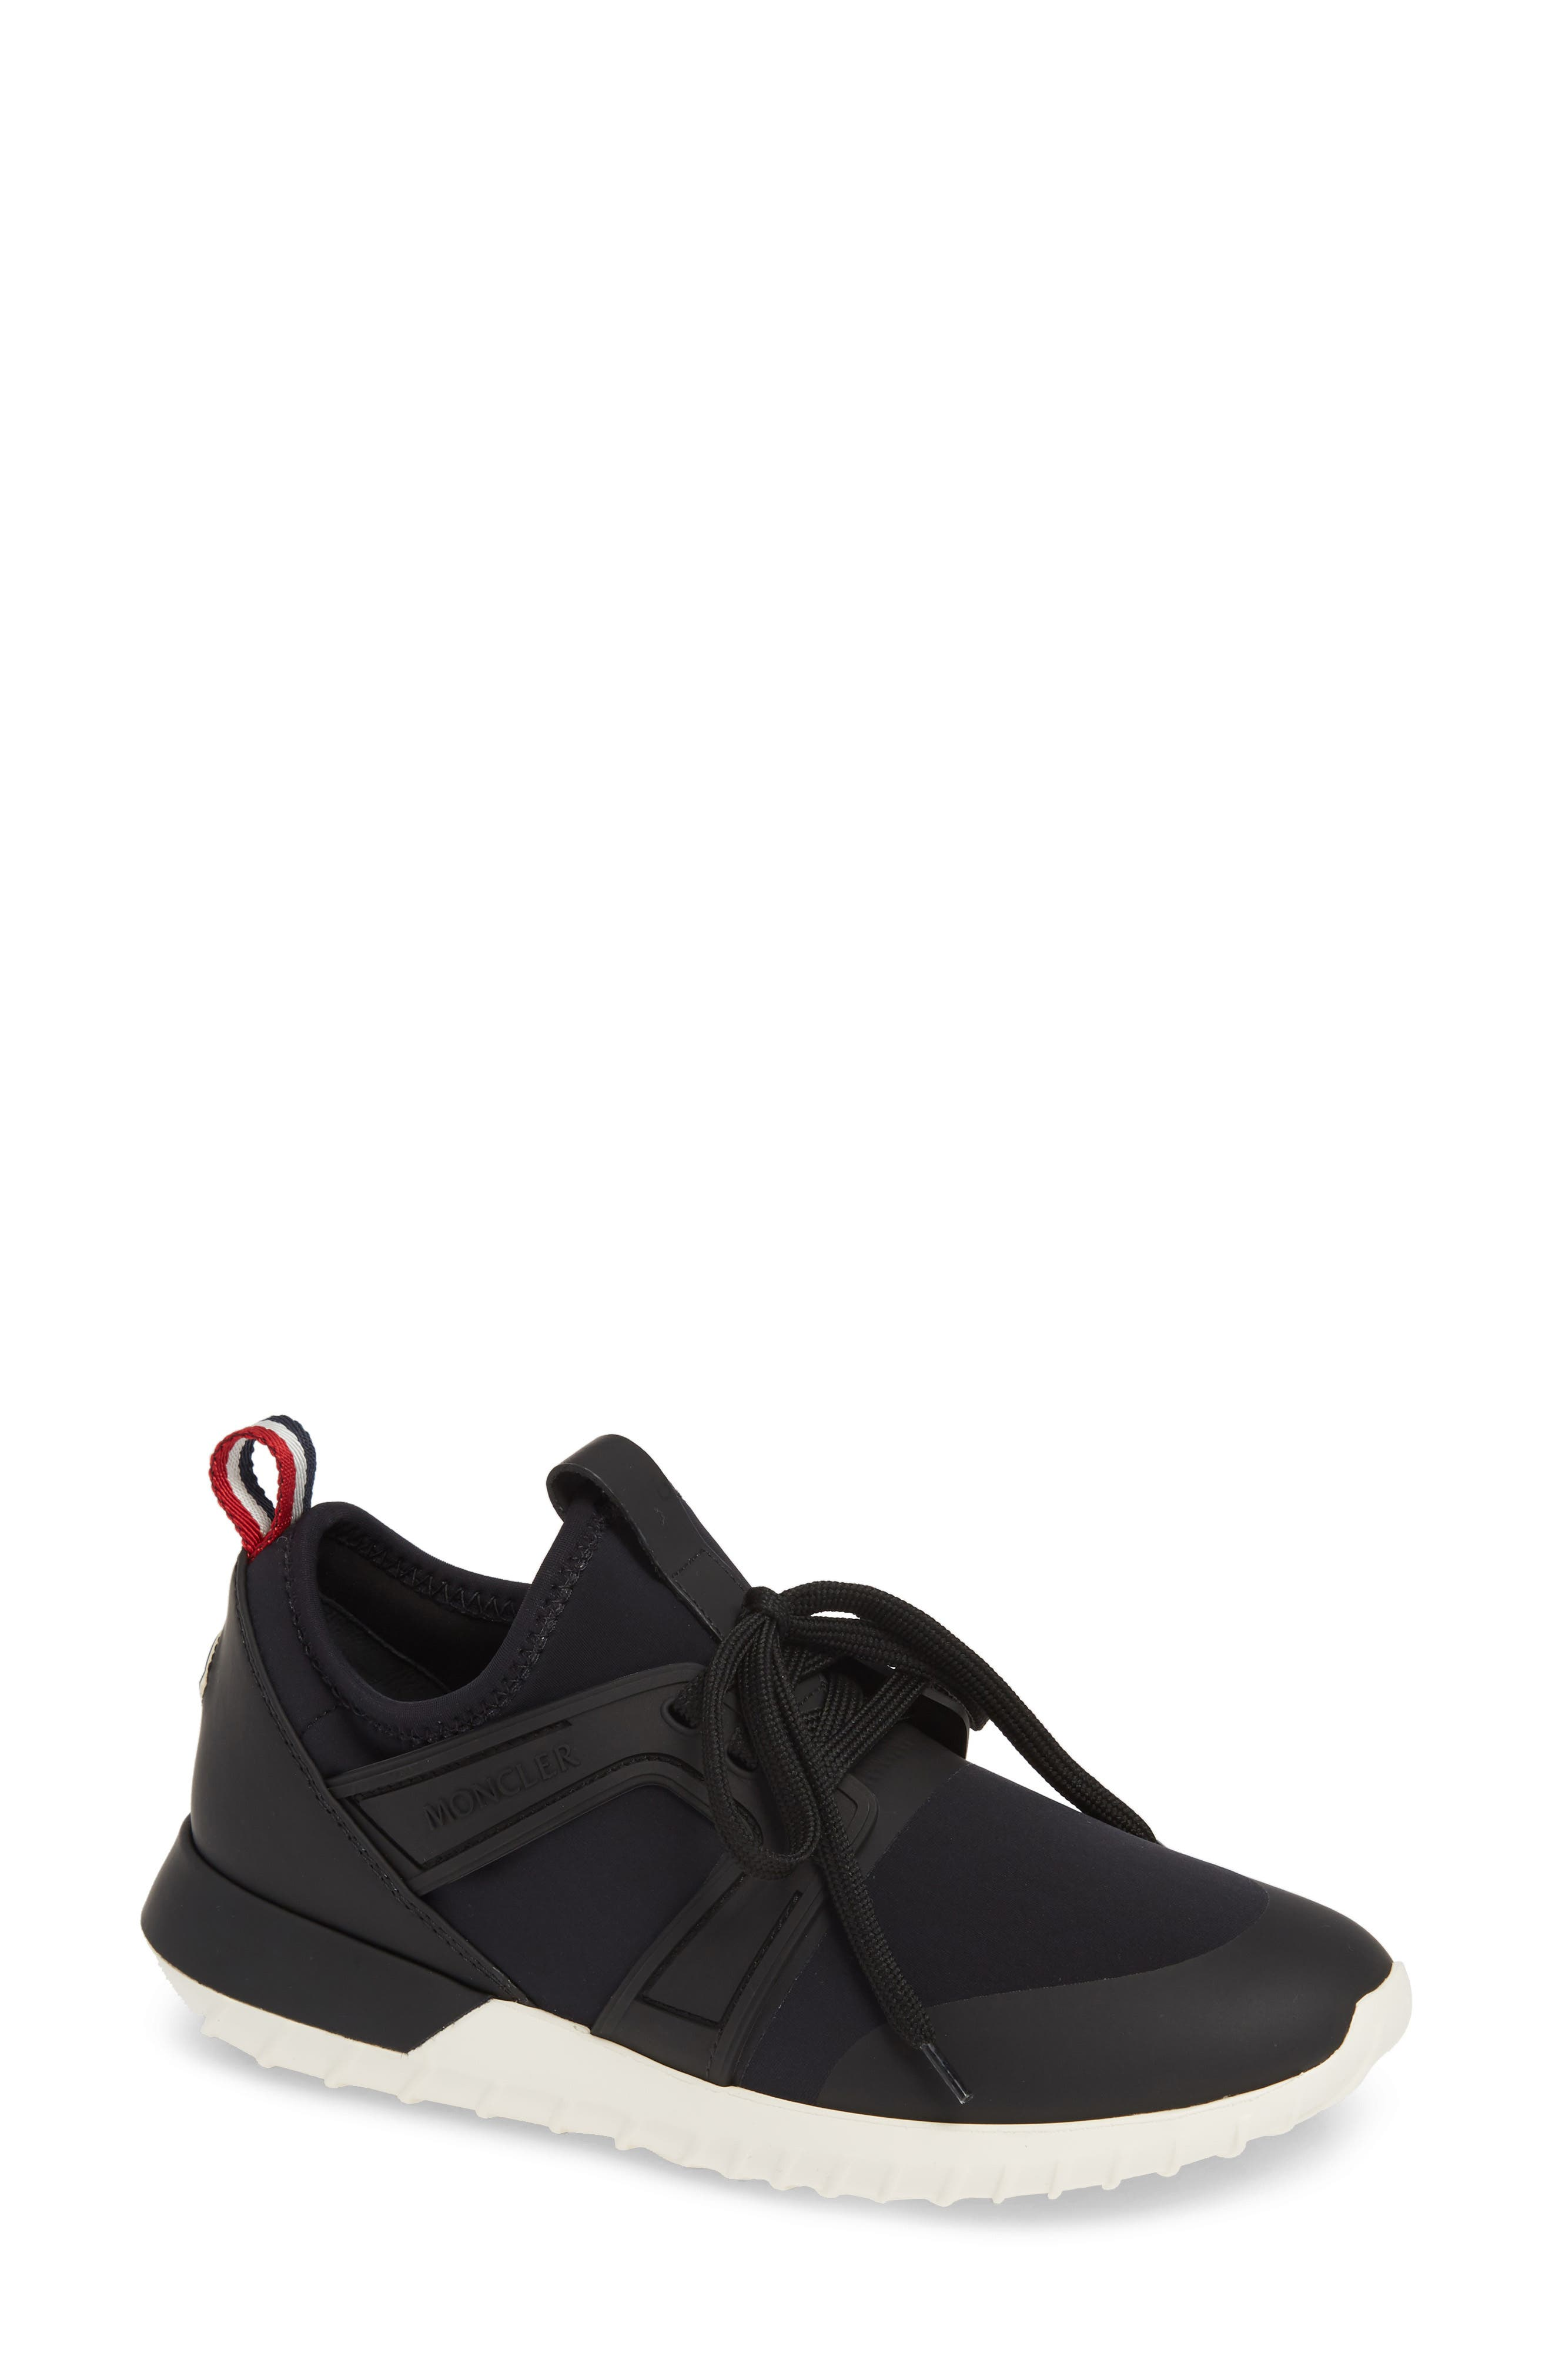 MONCLER, Meline Scarpa Sneaker, Main thumbnail 1, color, BLACK